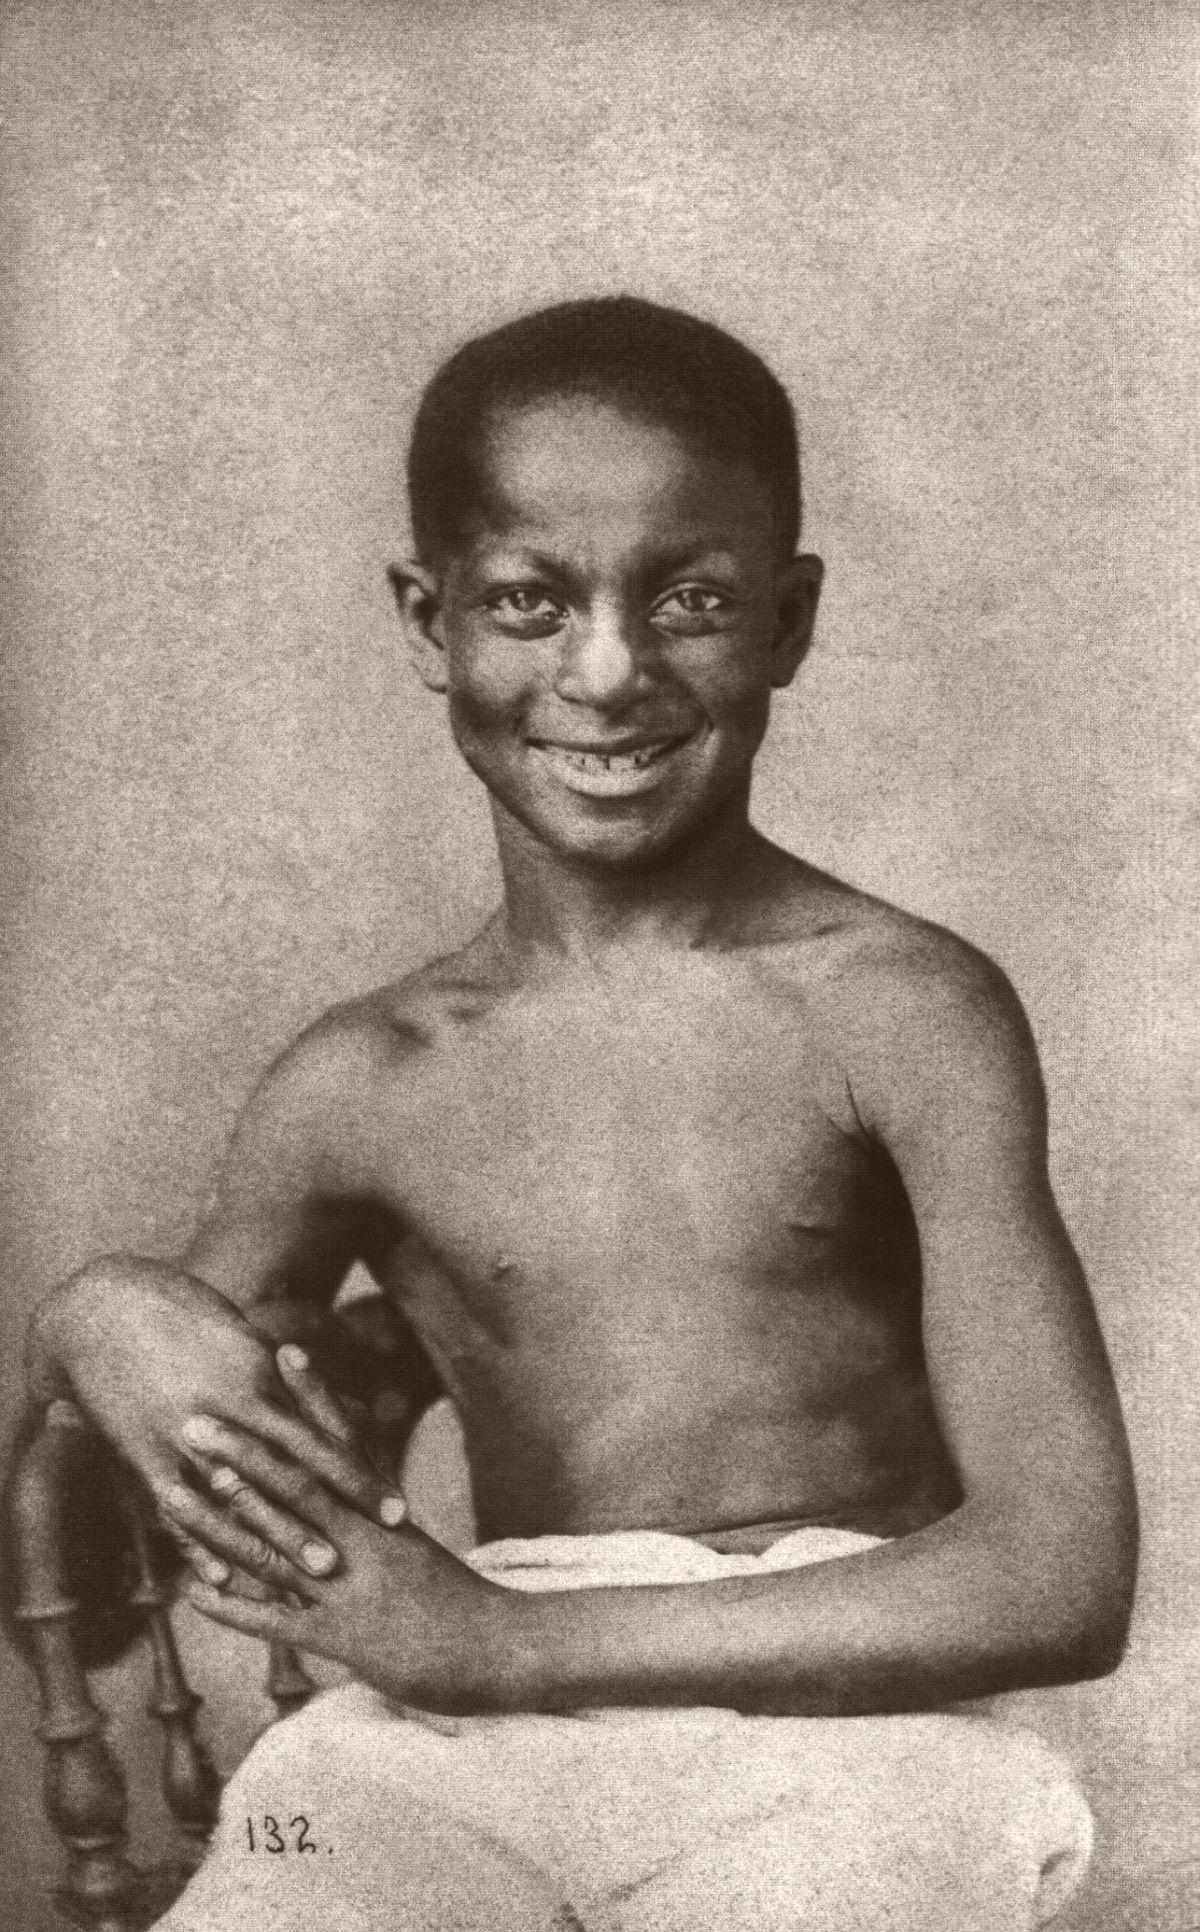 Menino sorridente. 1882